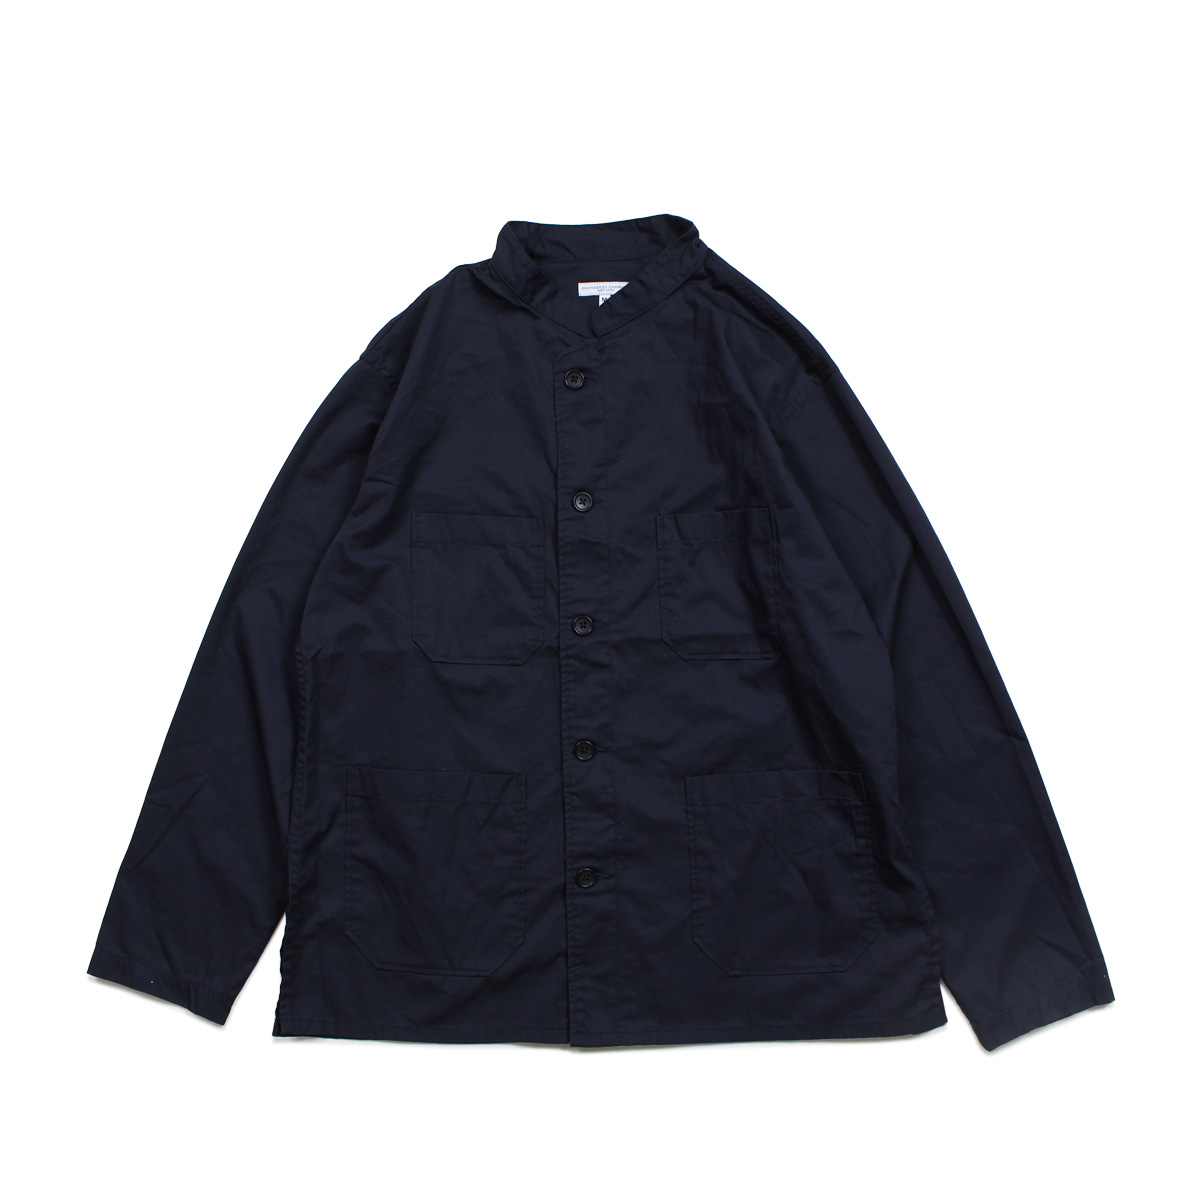 ENGINEERED GARMENTS DAYTON SHIRT エンジニアドガーメンツ シャツ 長袖 バンドカラーシャツ メンズ ダーク ネイビー カーキ ライト ブルー 19SA009